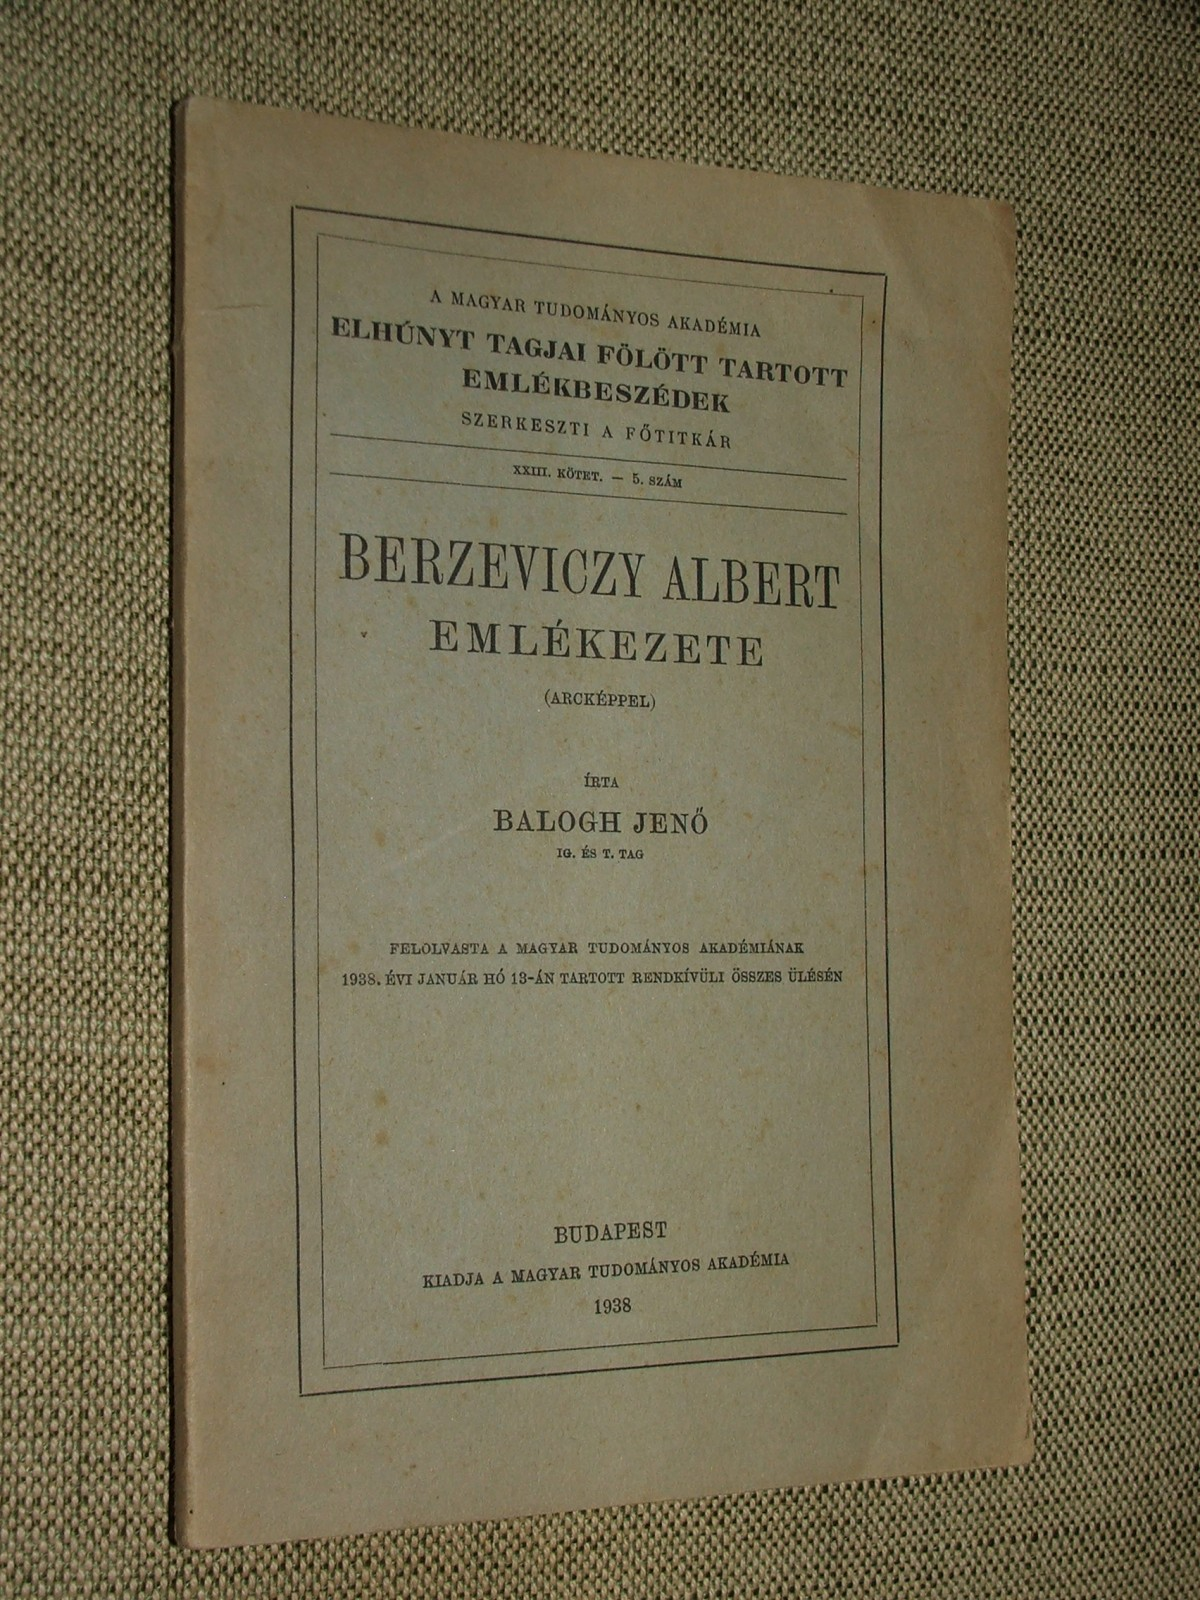 BALOGH Jenő: Berzevichy Albert emlékezete